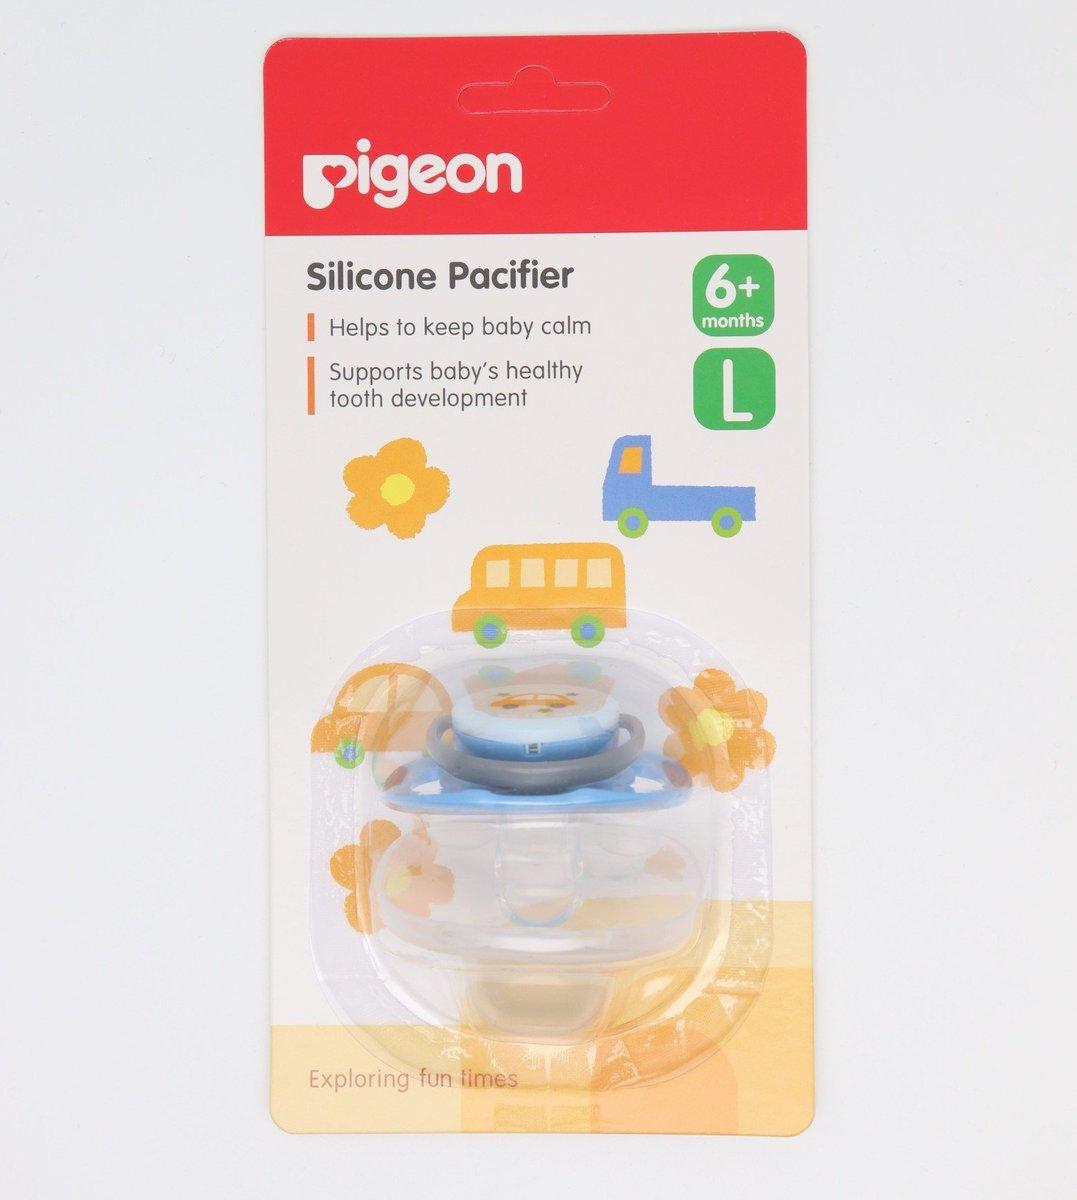 PIGEON 貝親   PIGEON貝親安撫奶嘴L碼六個月以上使用(藍色)   香港電視 HKTVmall 網上購物